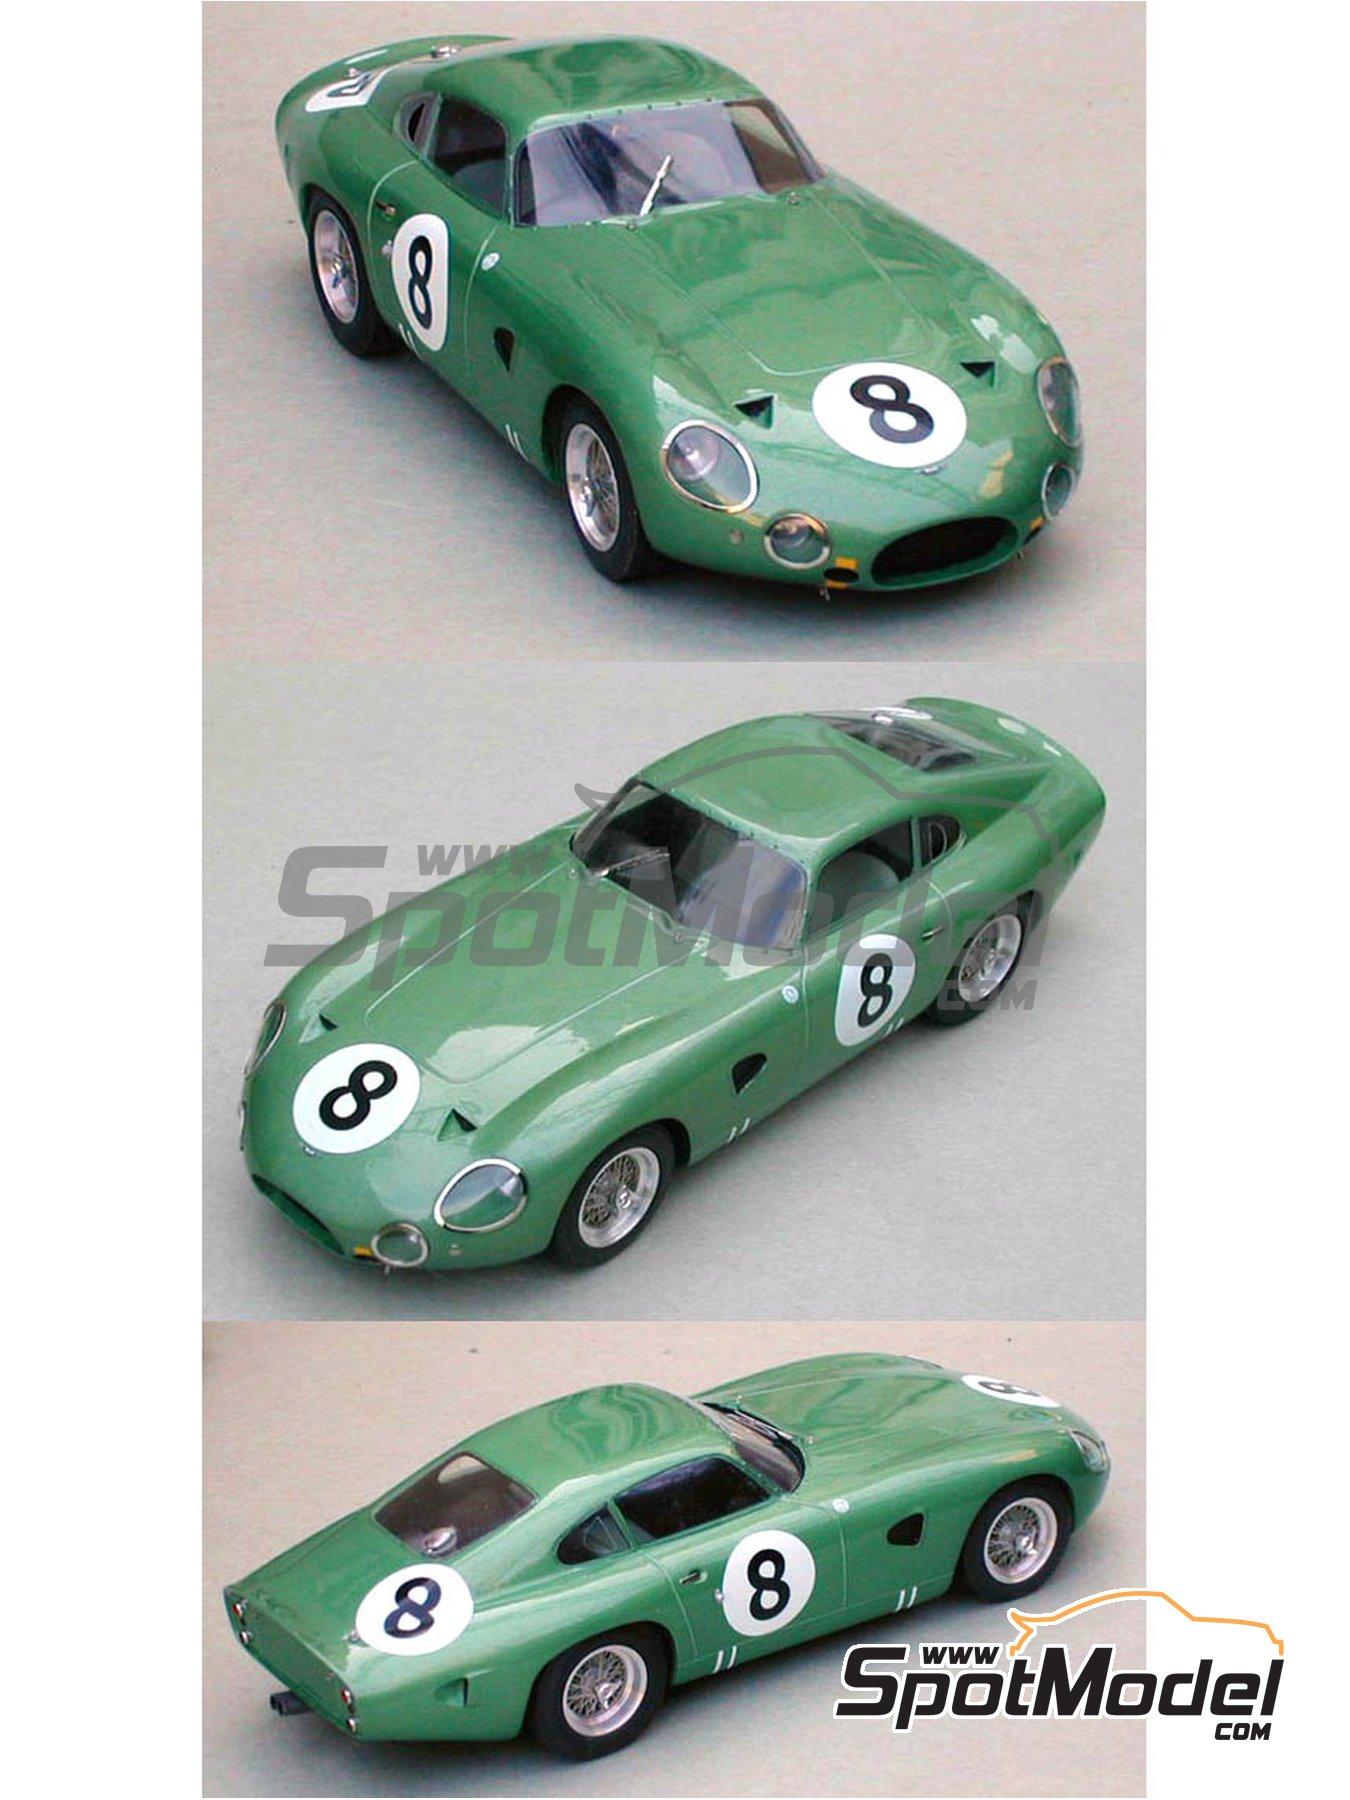 Aston Martin DP214   24 Hours Le Mans 1963 | Model Car Kit In 1/